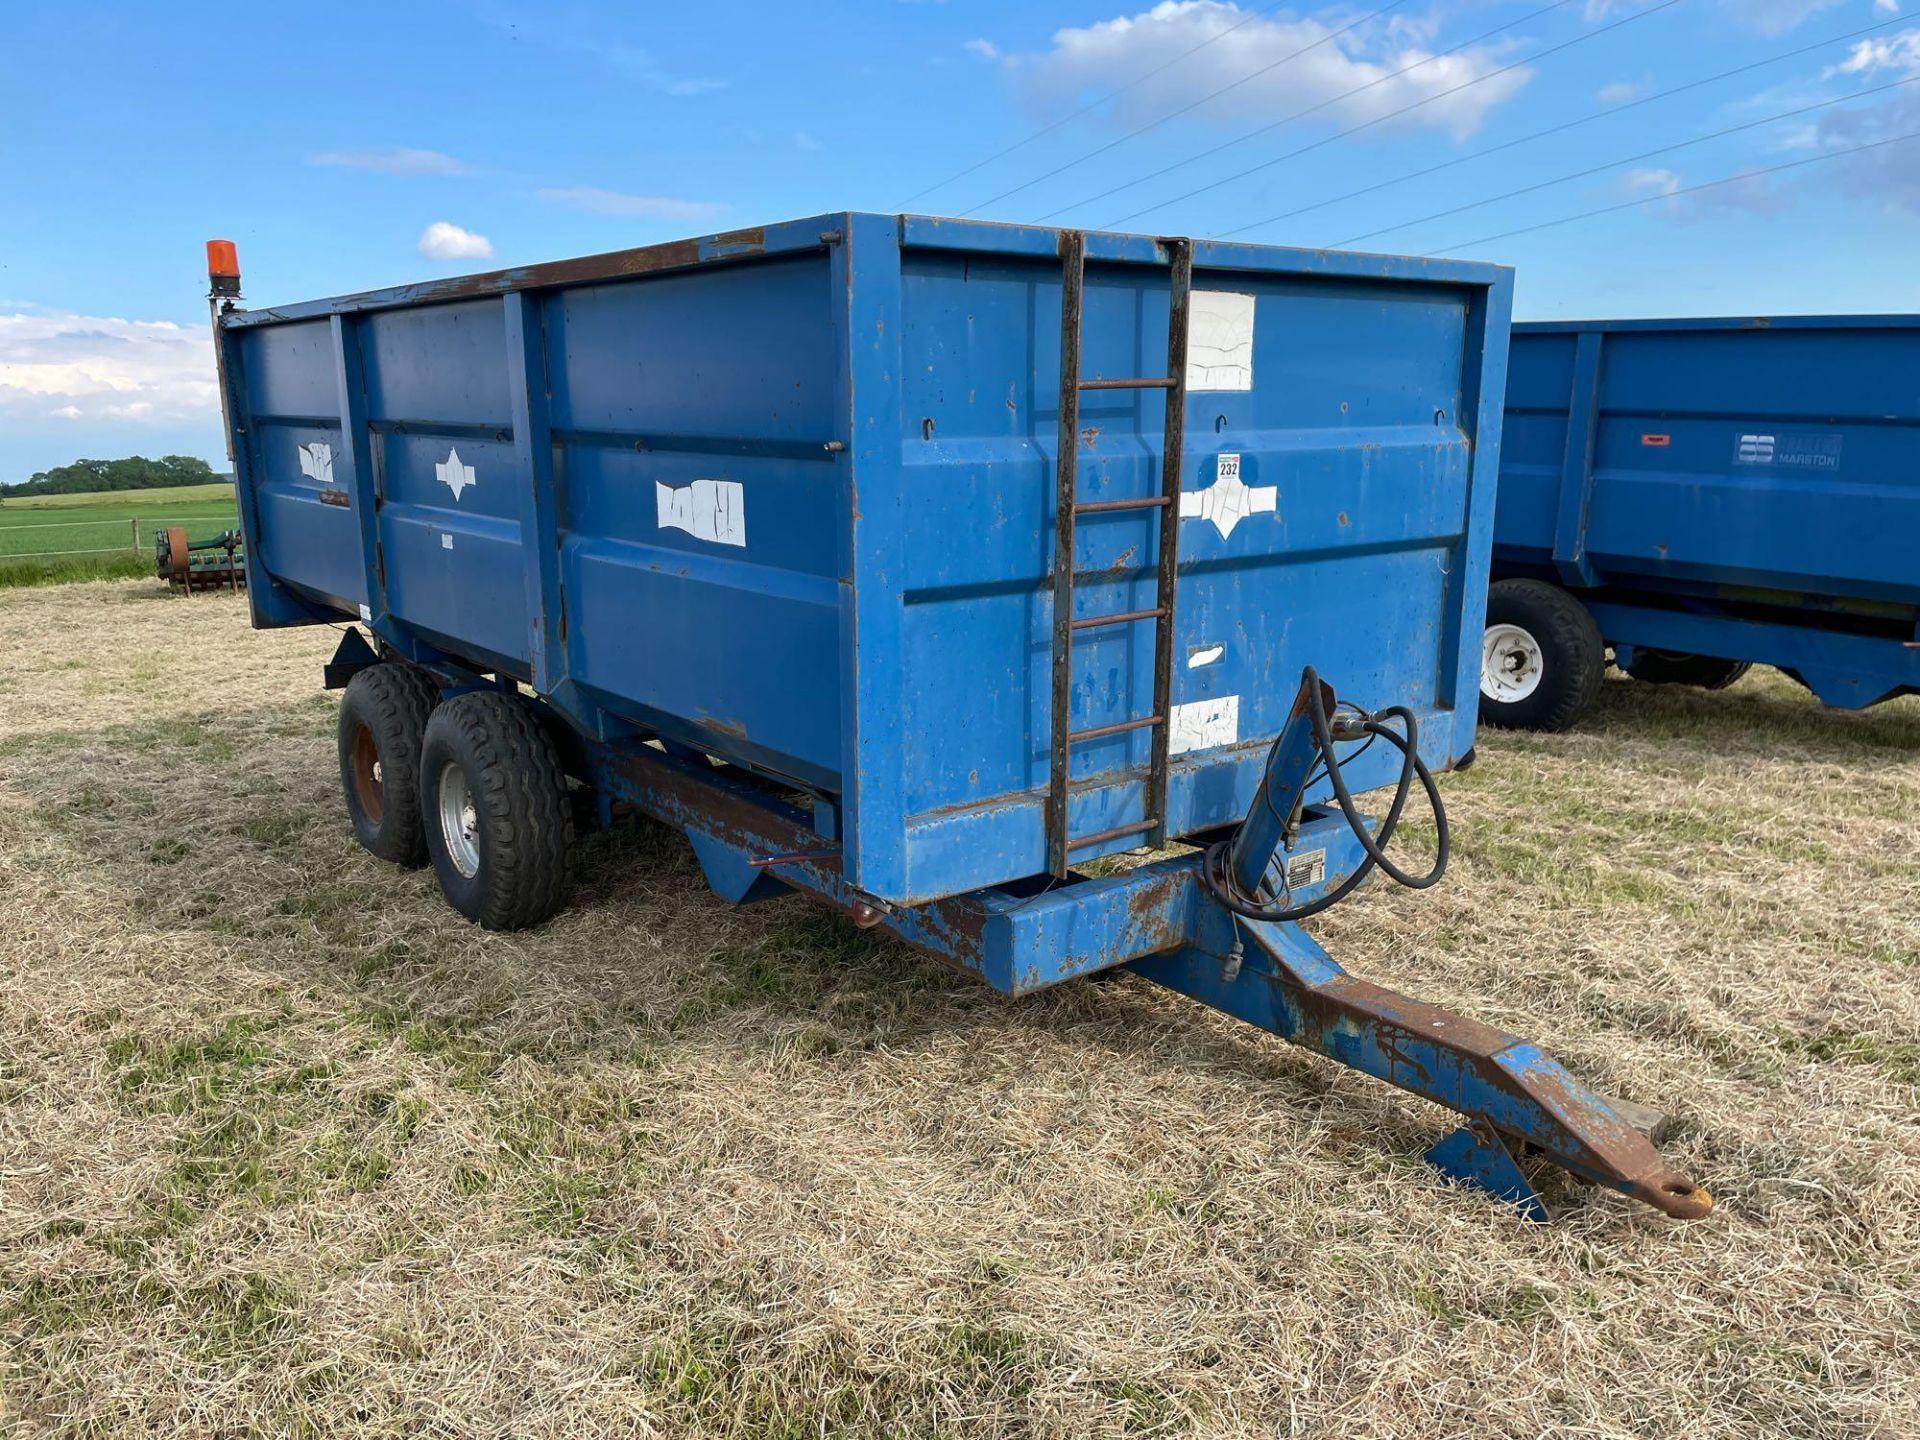 1984 AS Marston 10t twin axle grain trailer, manual tailgate and grain chute on 12./80-15.30 wheels